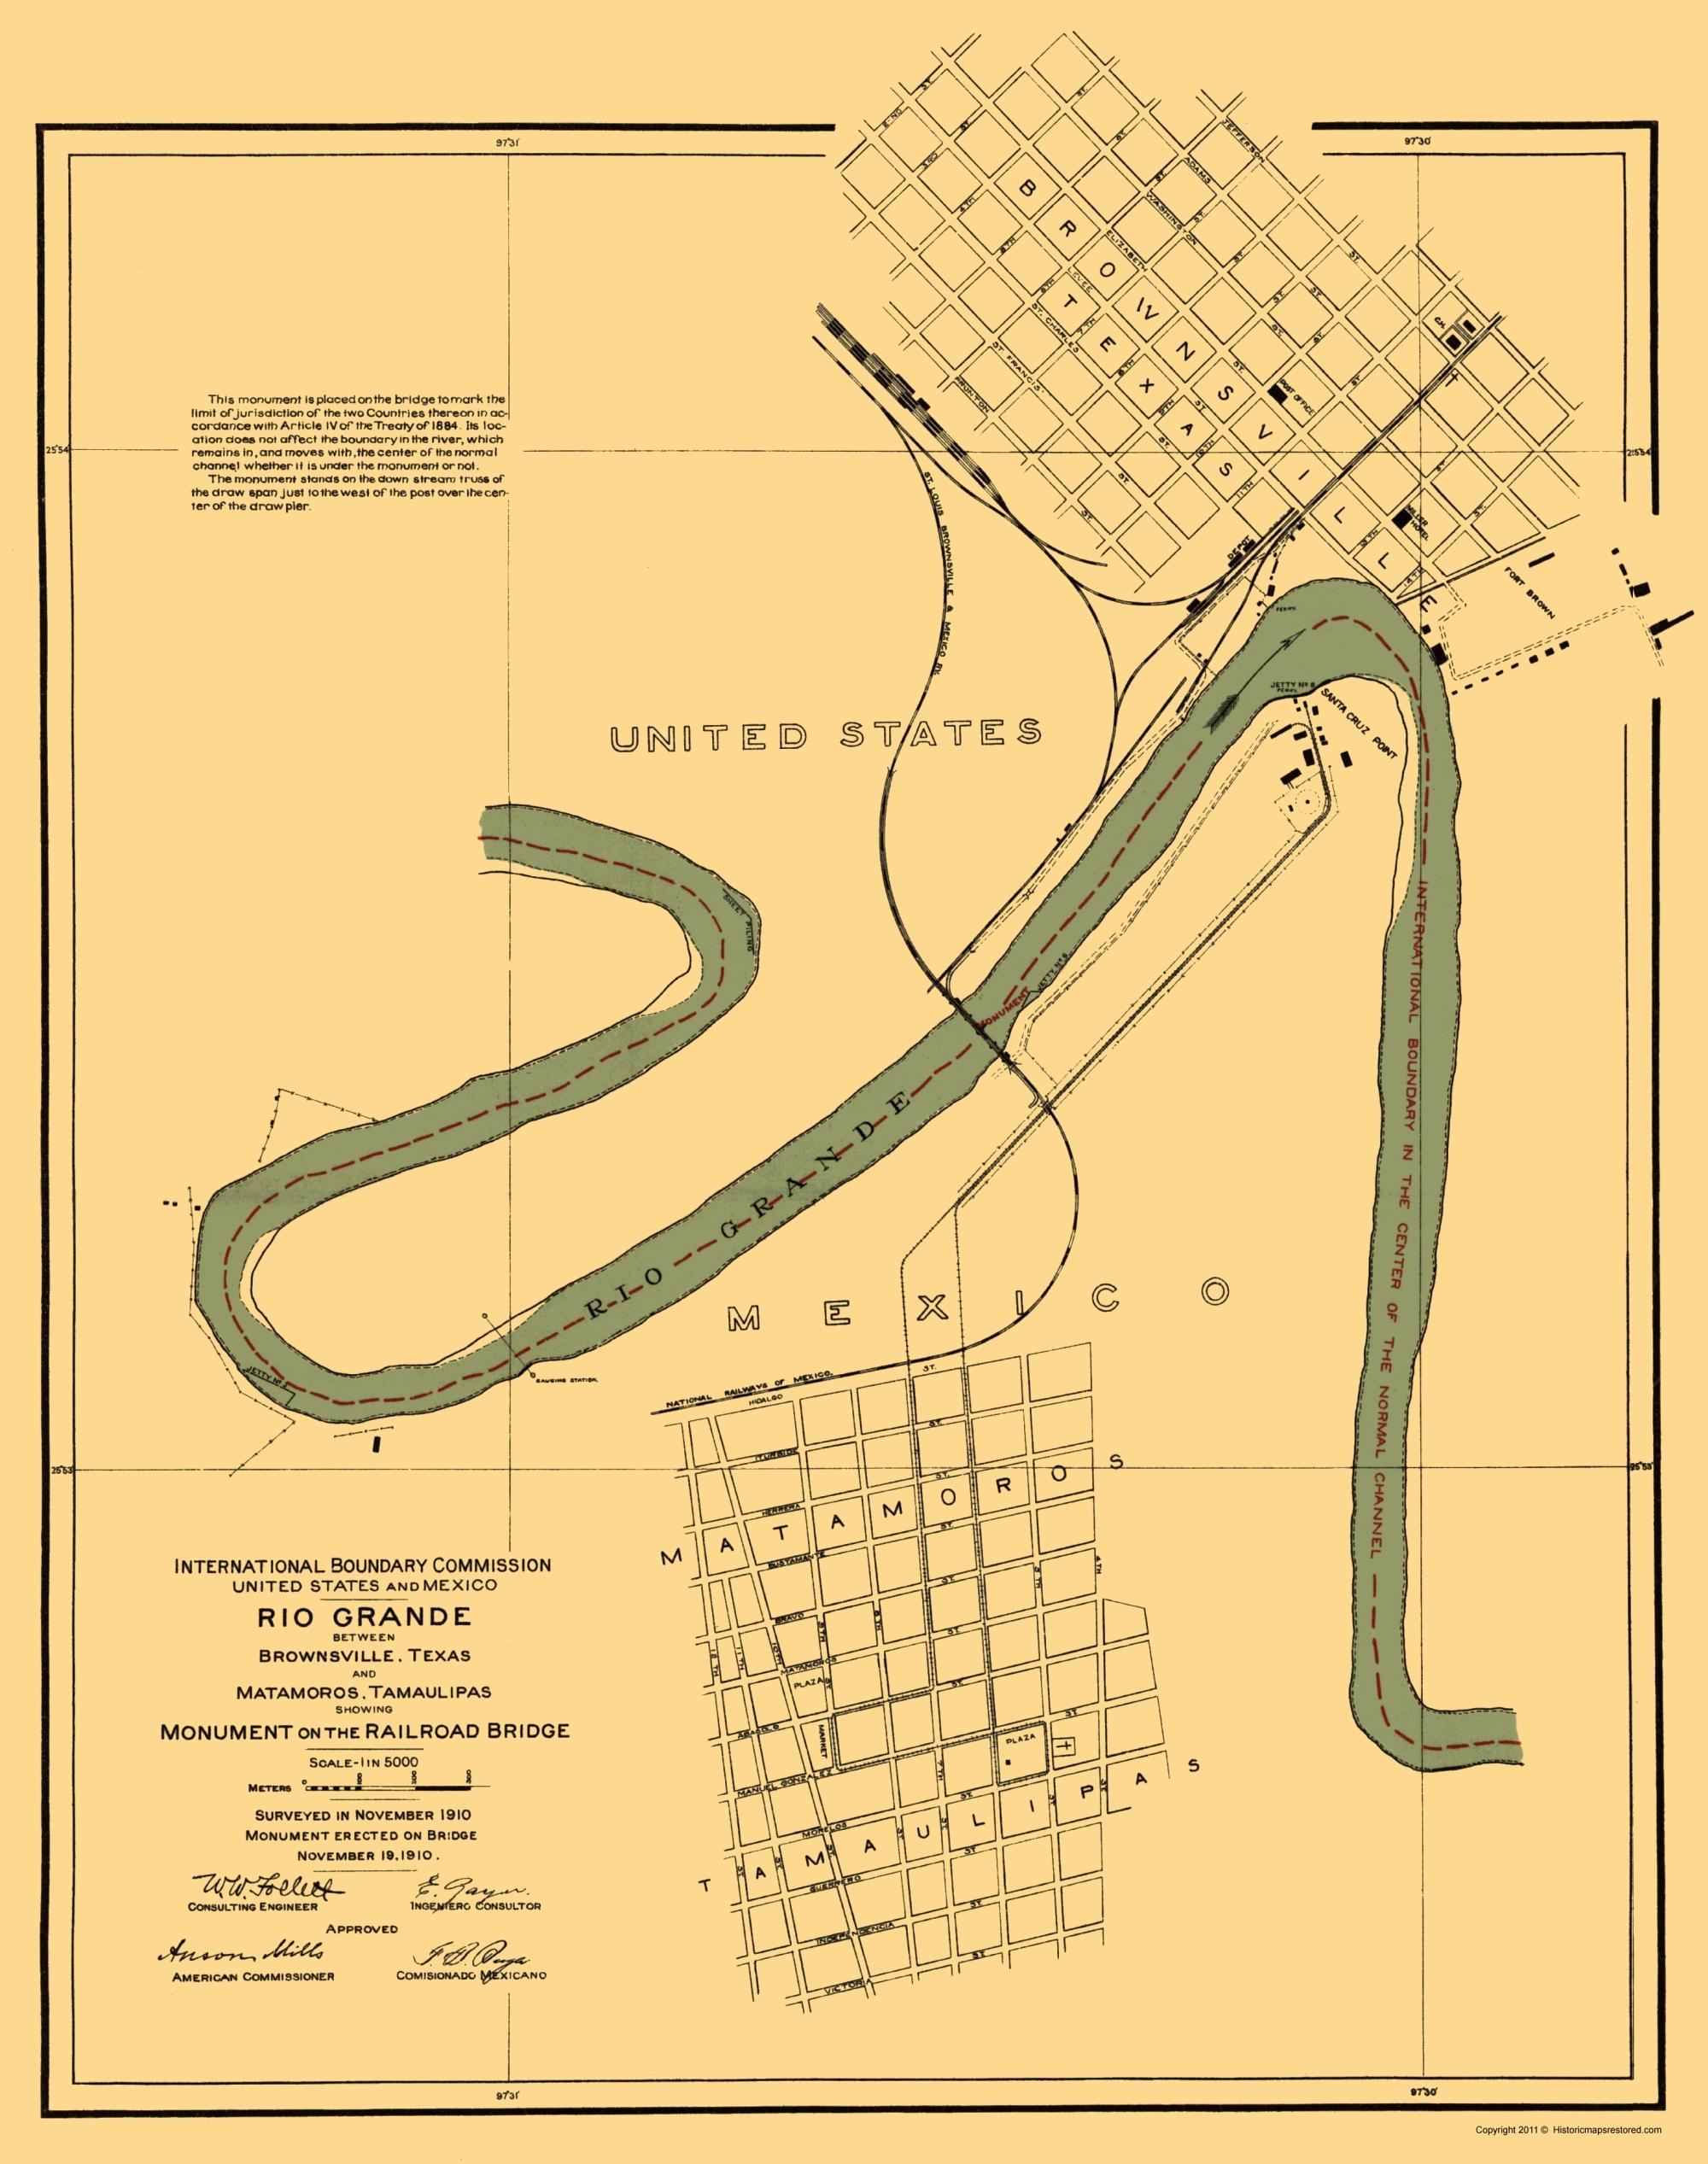 Old Map - Rio Grande Border, Matamoros, Brownsville 1910